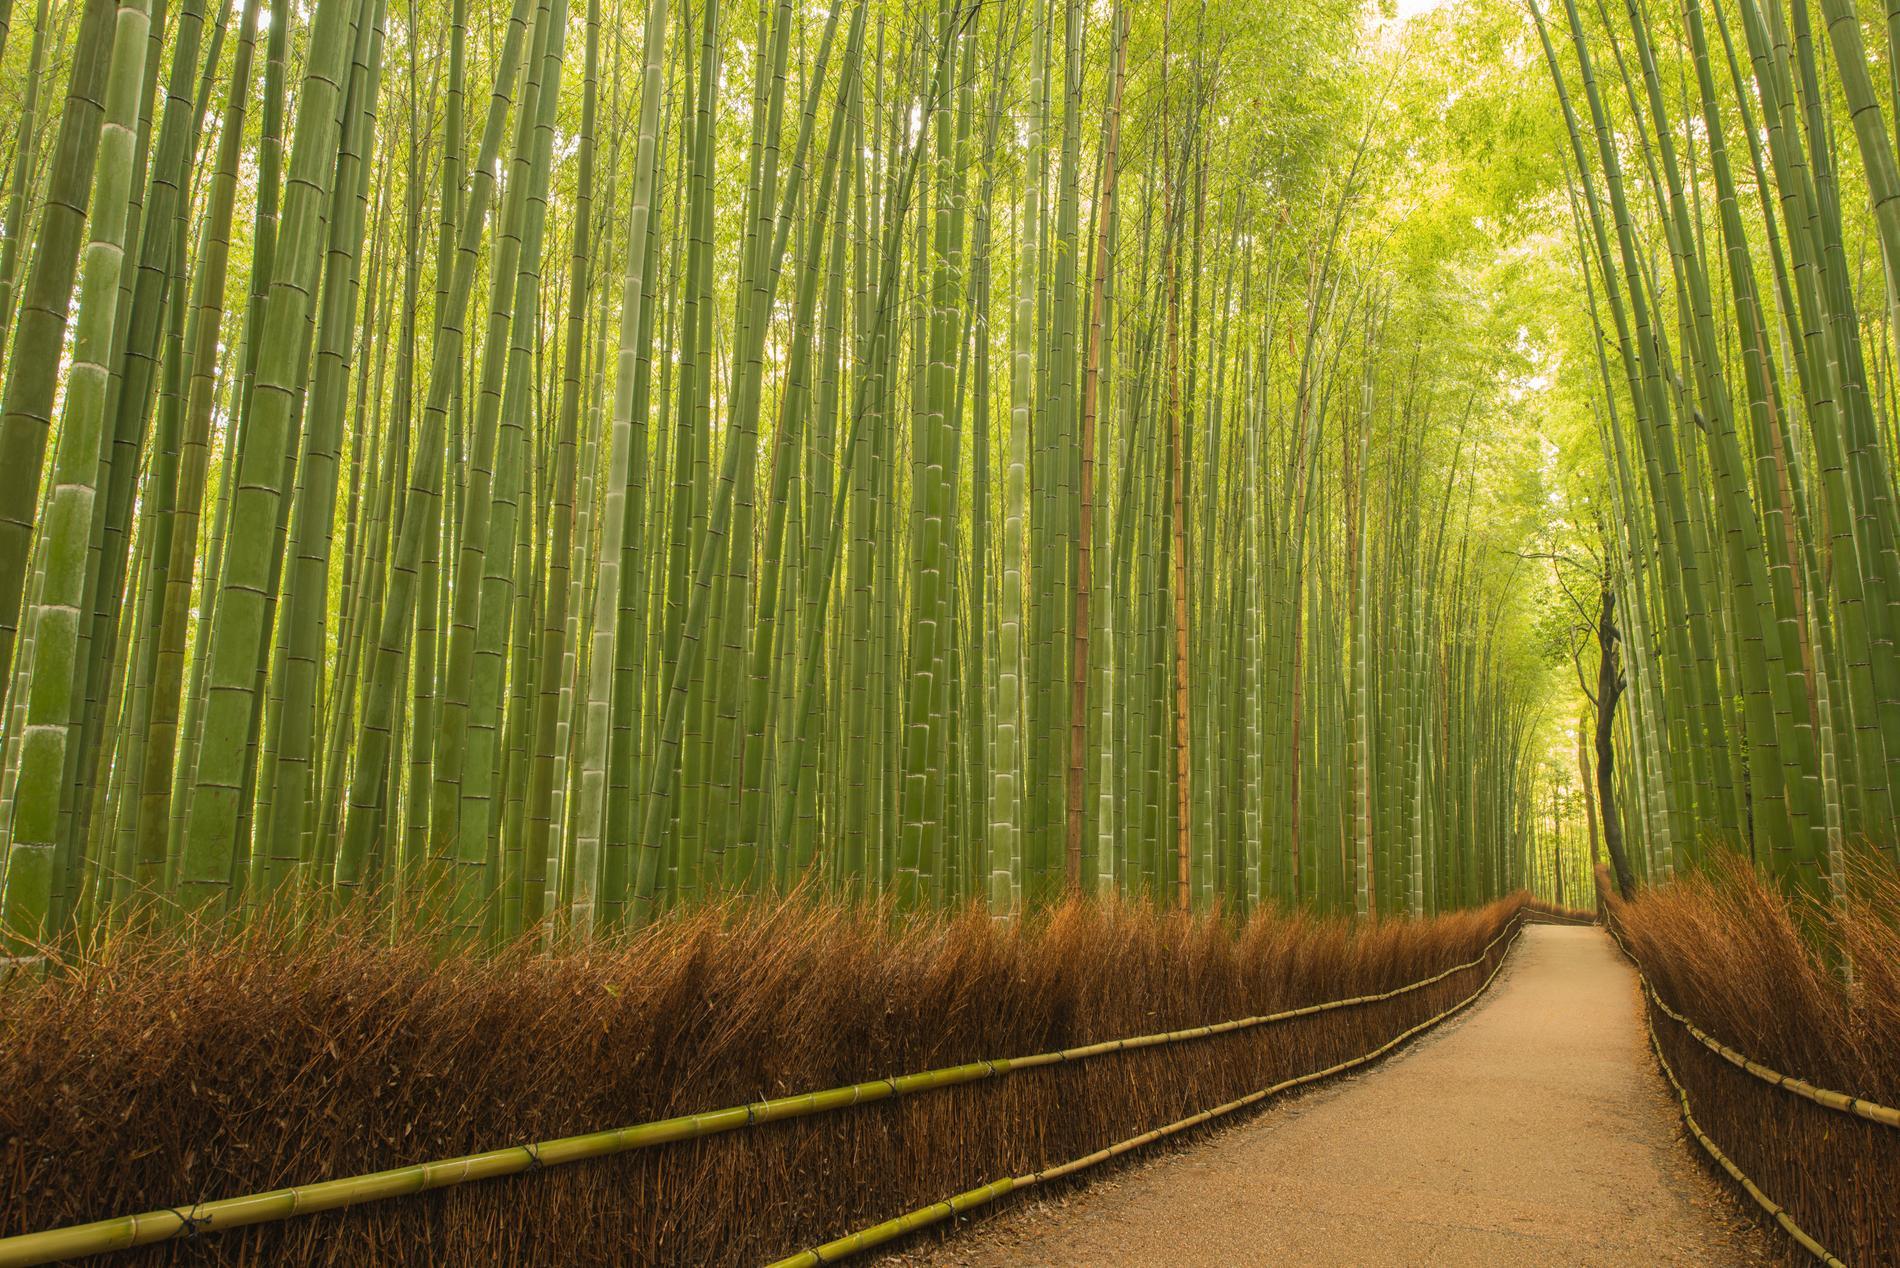 I rashiyama Bamboo Grove är man helt omringad av bambu.